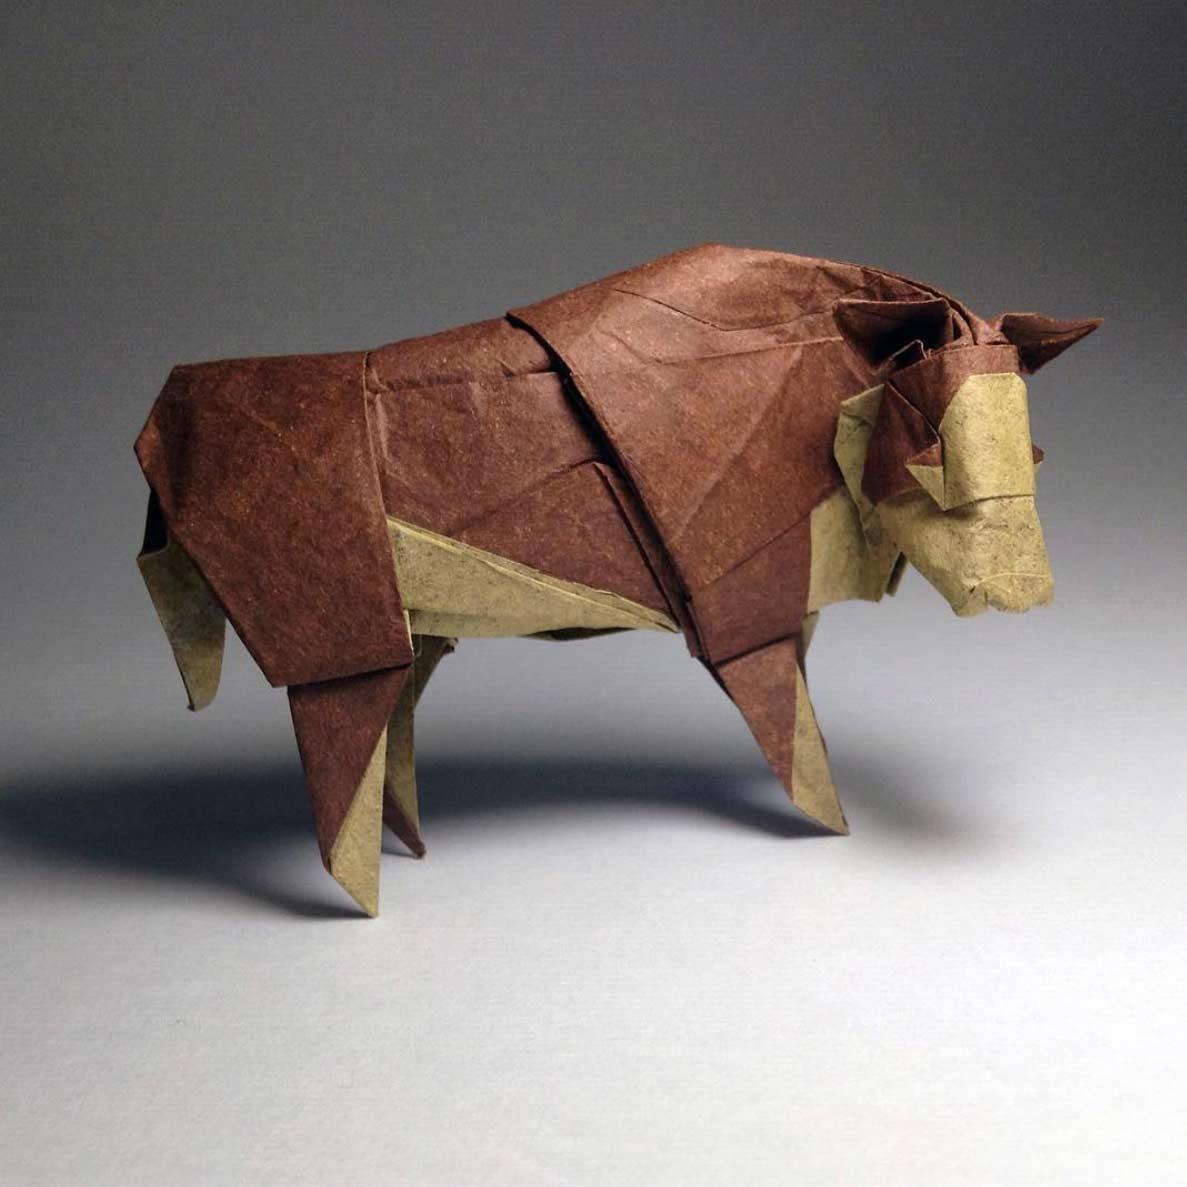 Geniale Origami-Kunstwerke von Robby Kraft Robby-Kraft-Origami_05